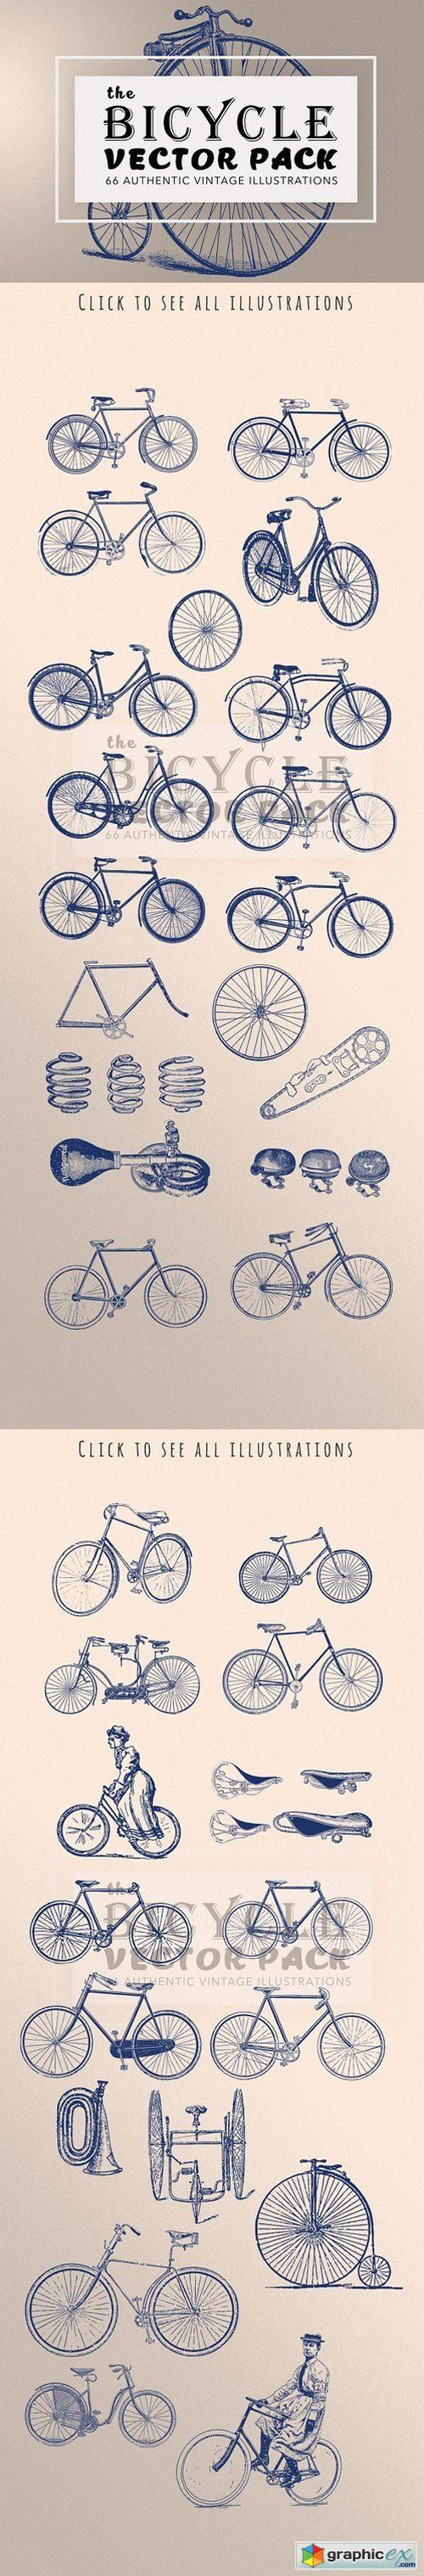 Vintage Bicycle Illustration Bundle  stock images